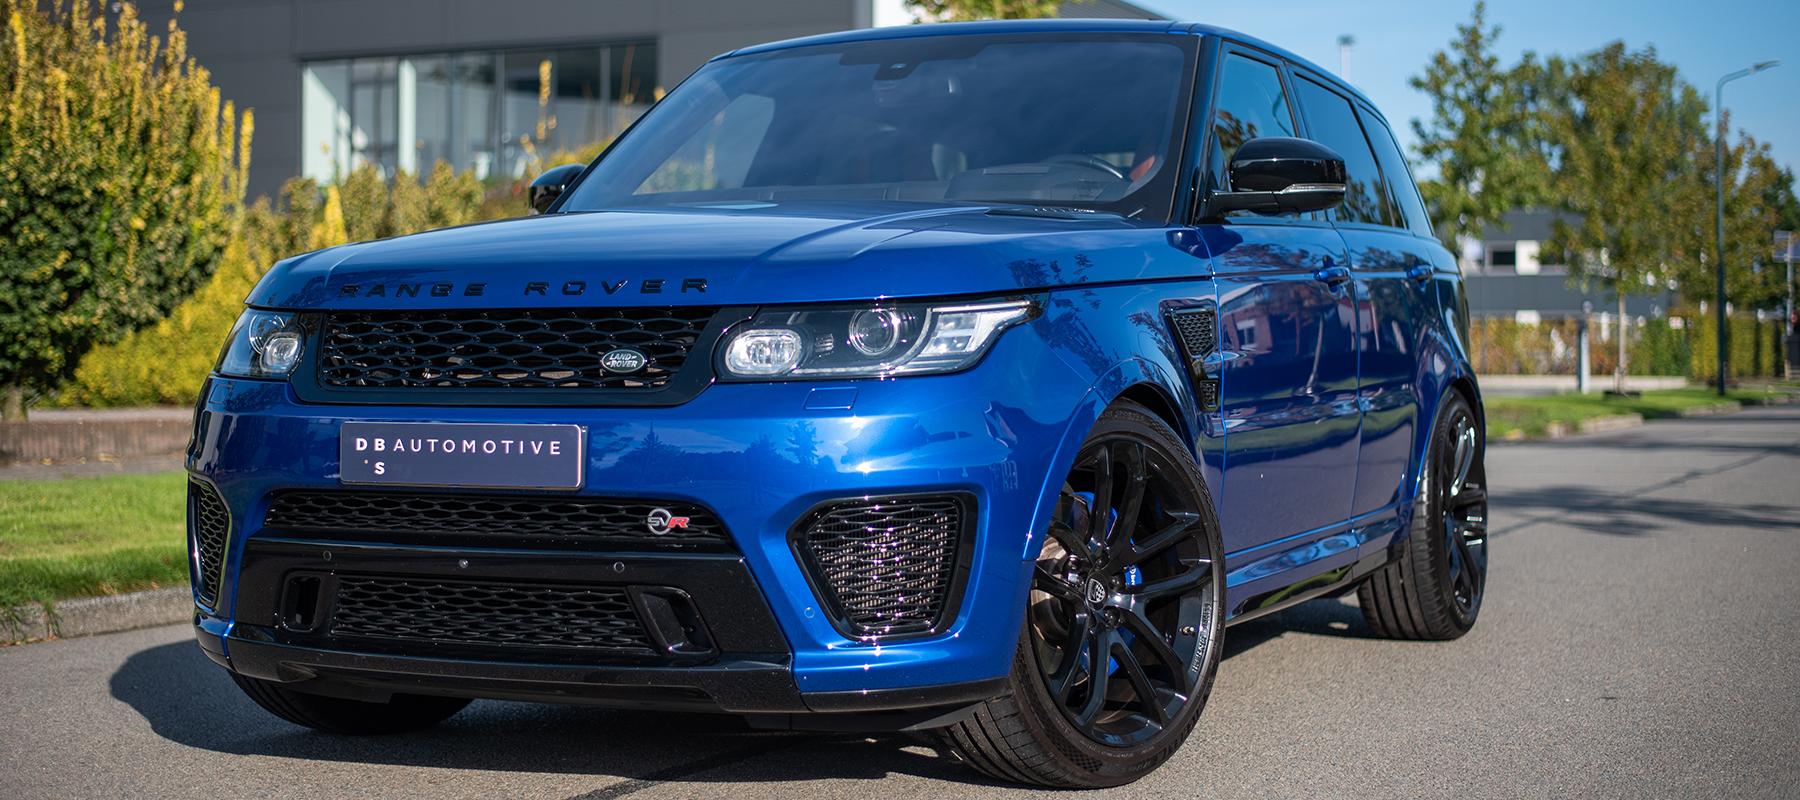 Range Rover occasion